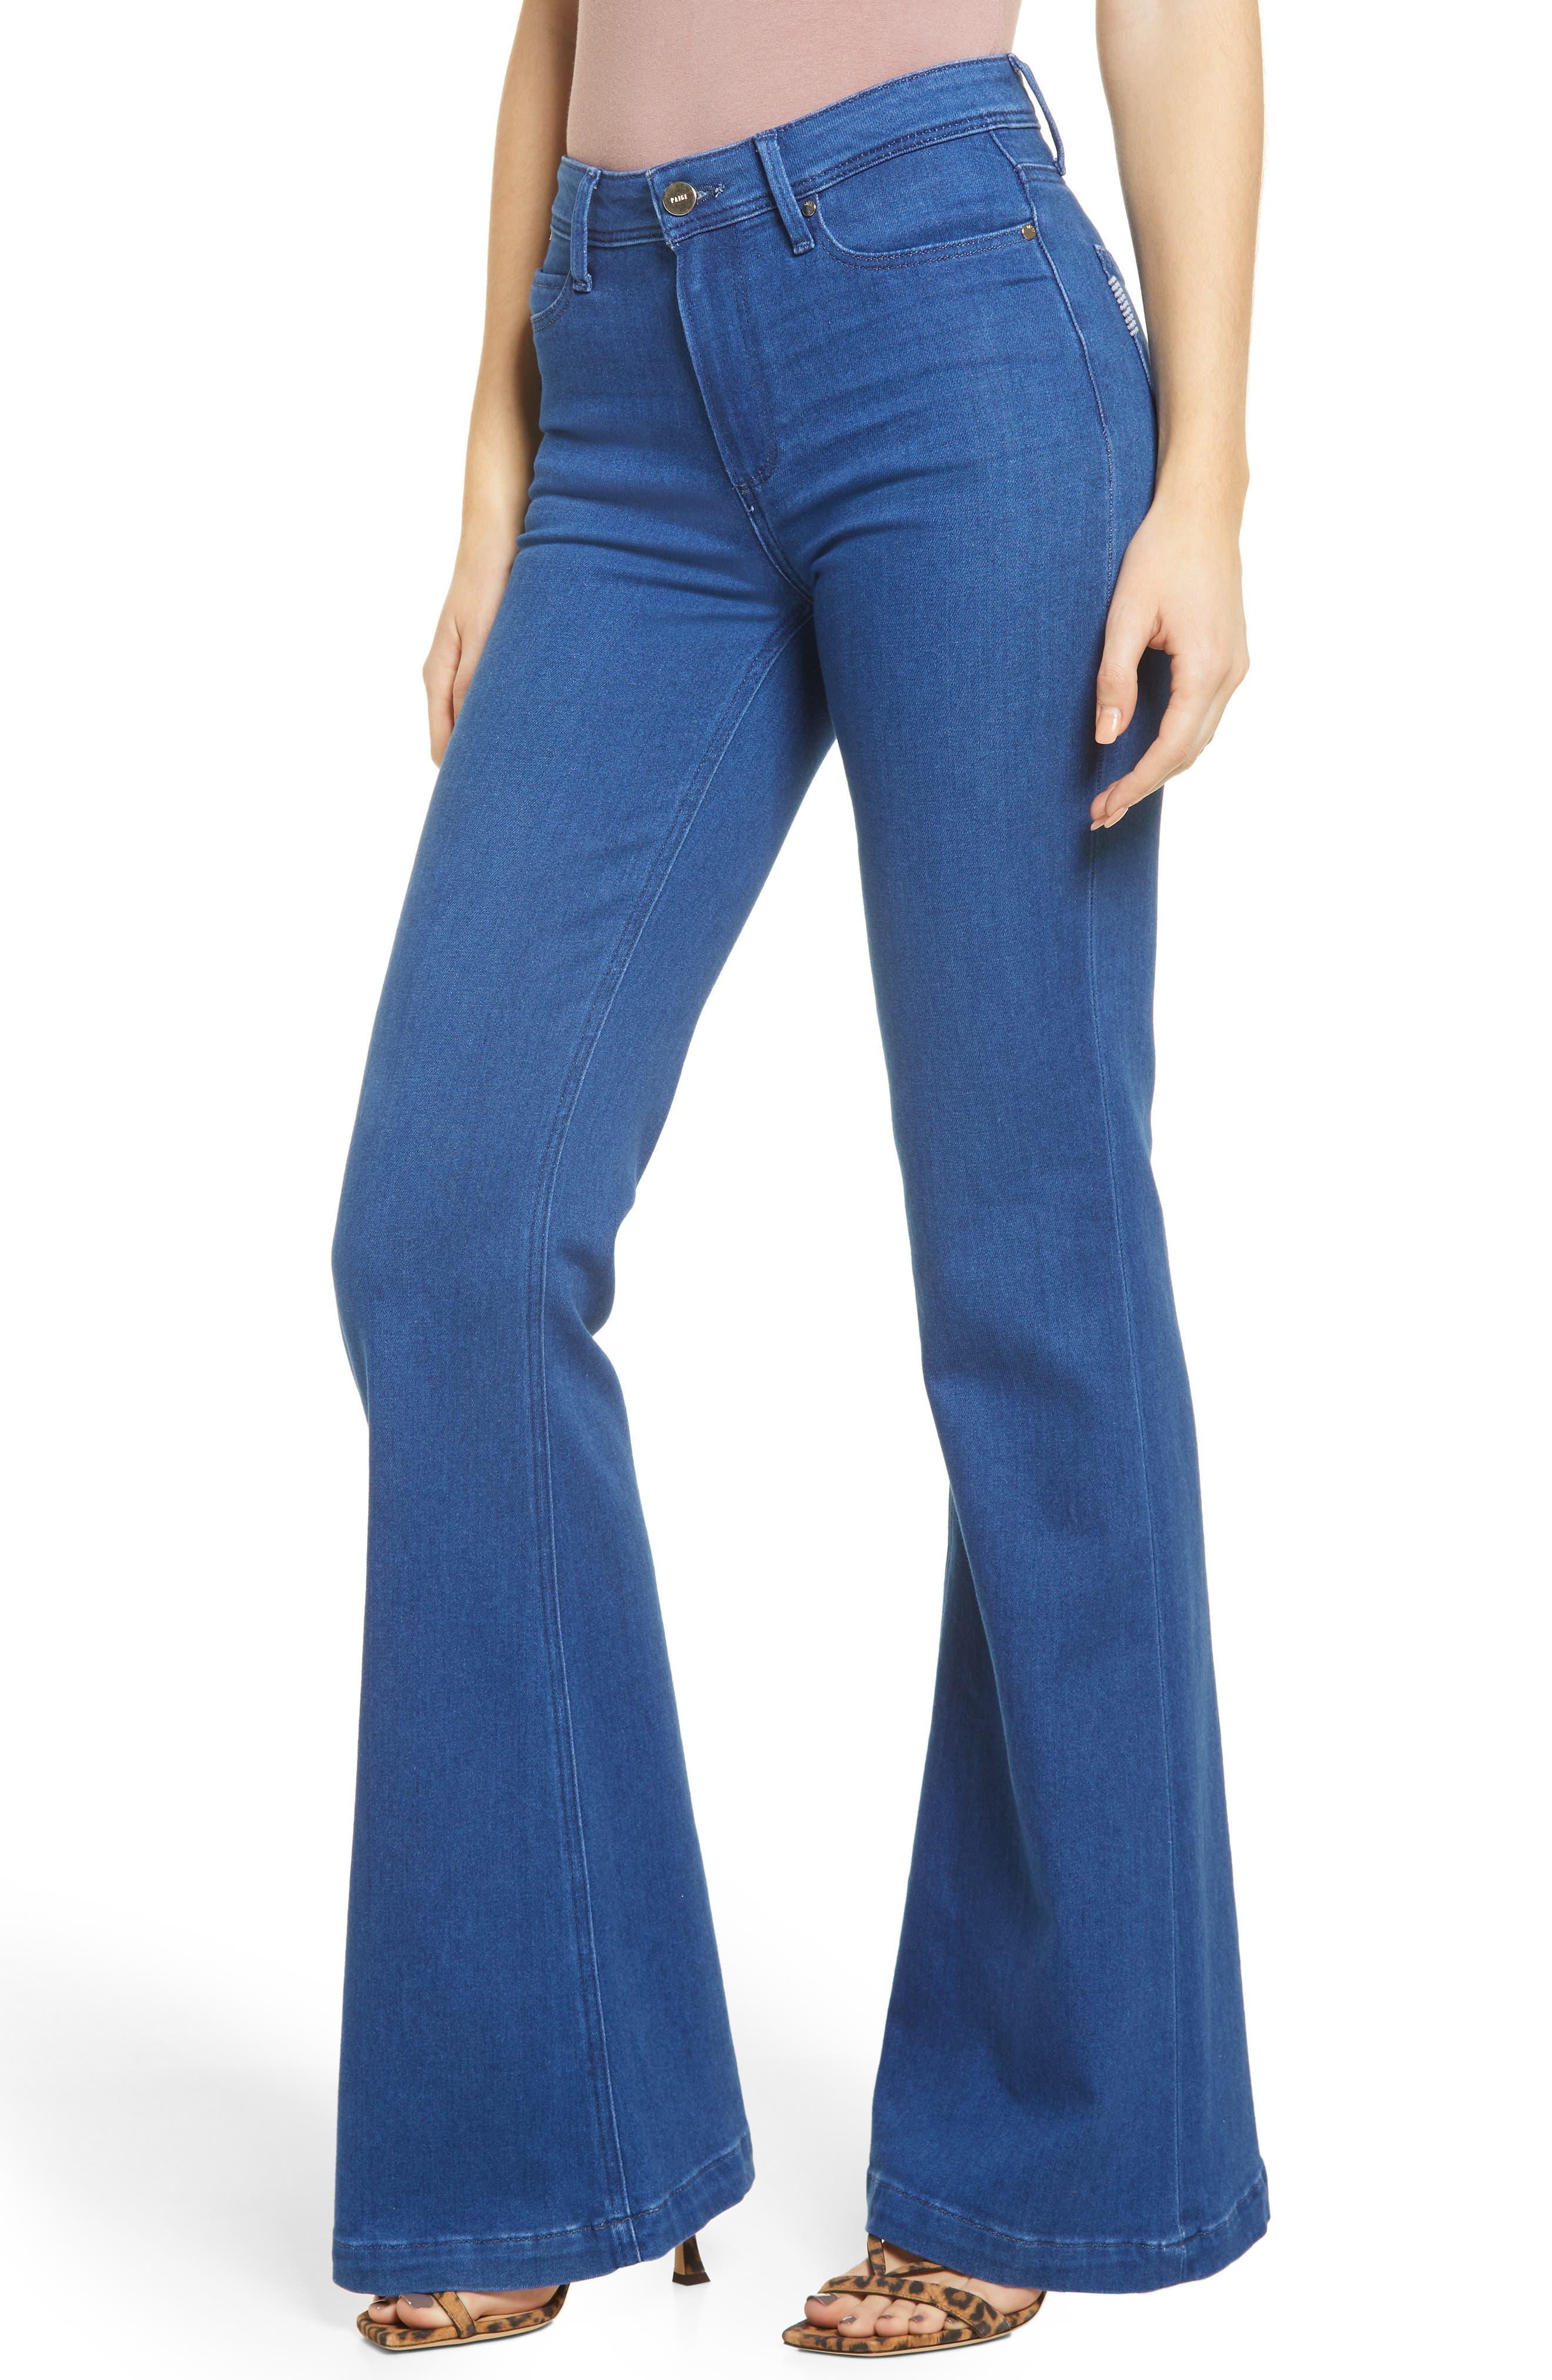 Women's Paige Genevieve High Waist Wide Leg Jeans